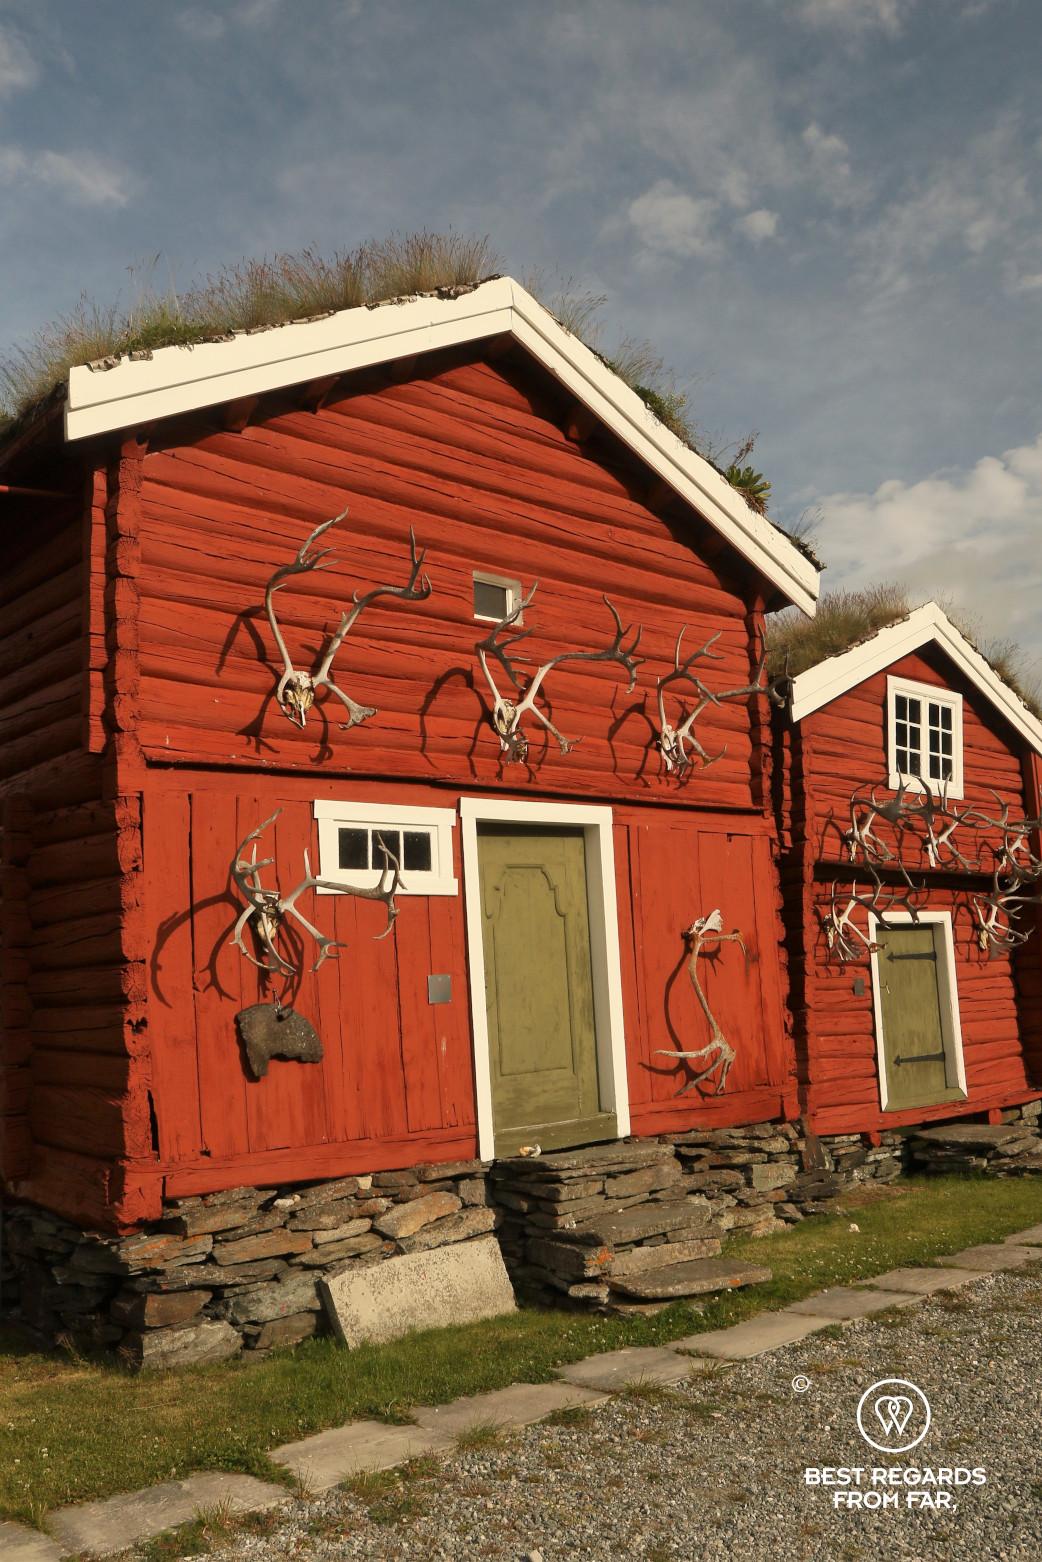 Reindeer antlers at the historic Kongsvold hotel, Norway